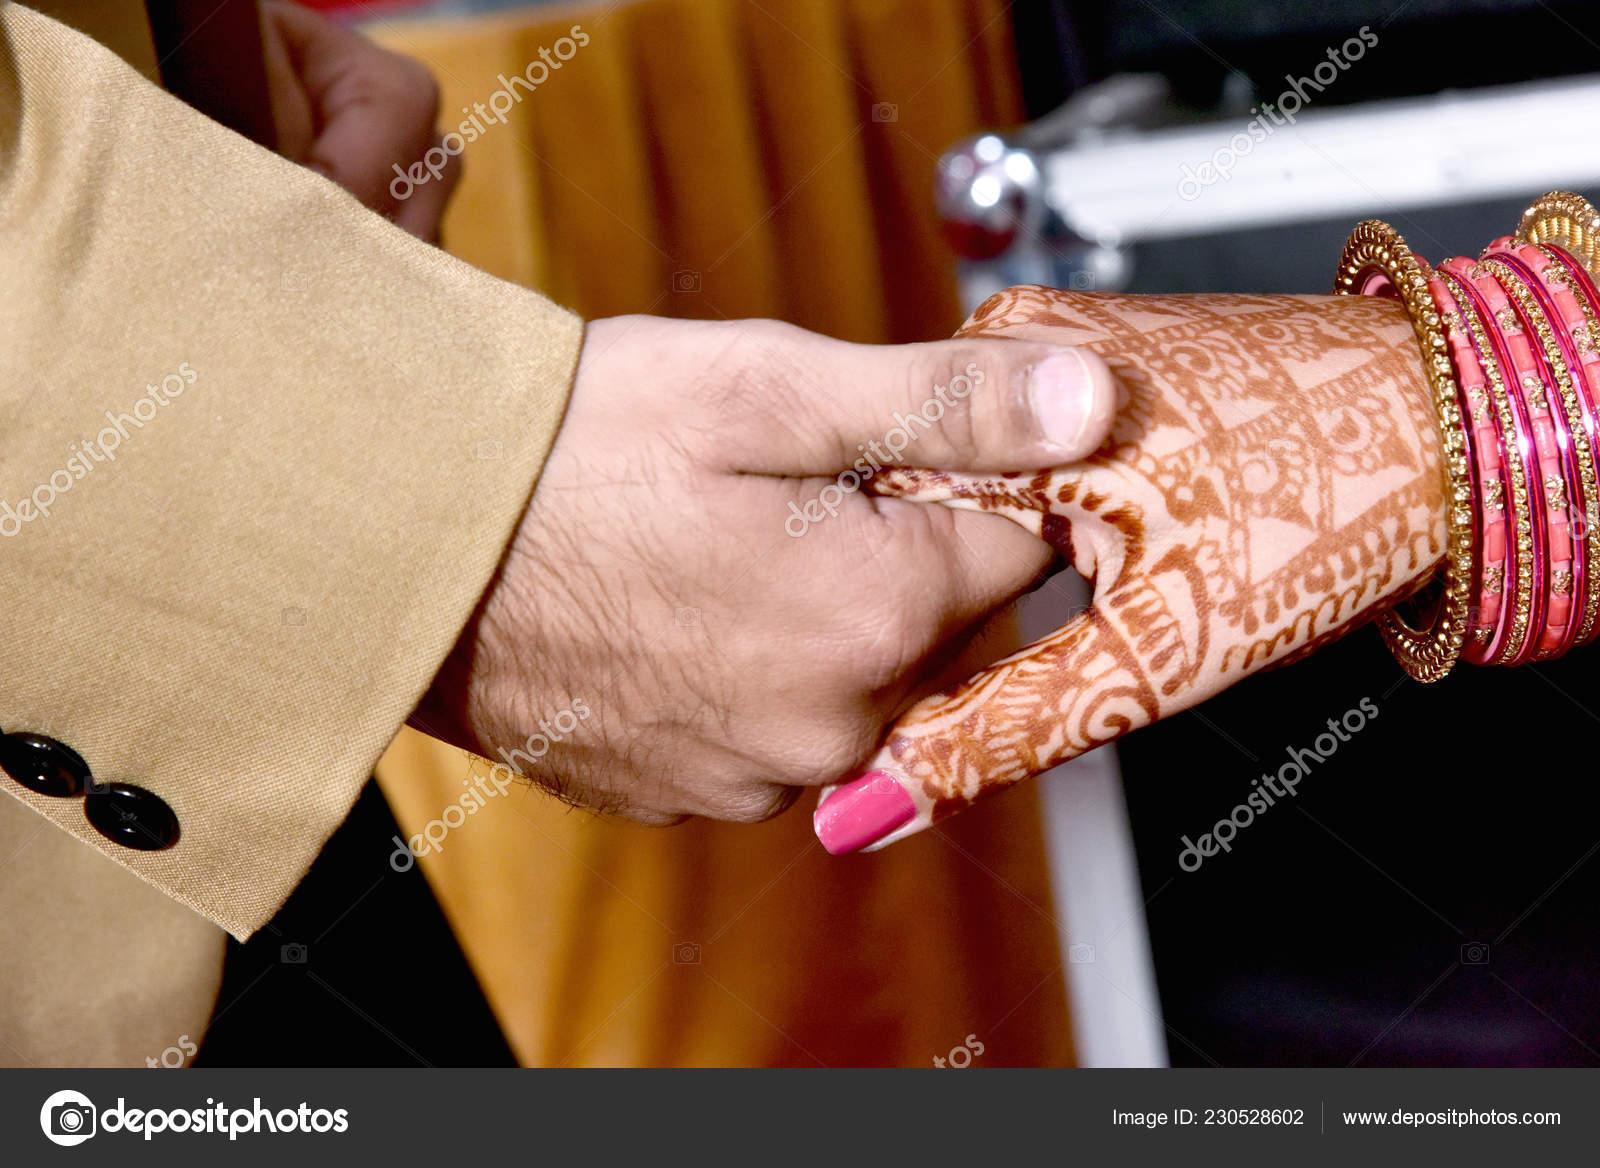 Bride Groom Hand Together Indian Wedding Stock Photo C Deepkcreation 230528602